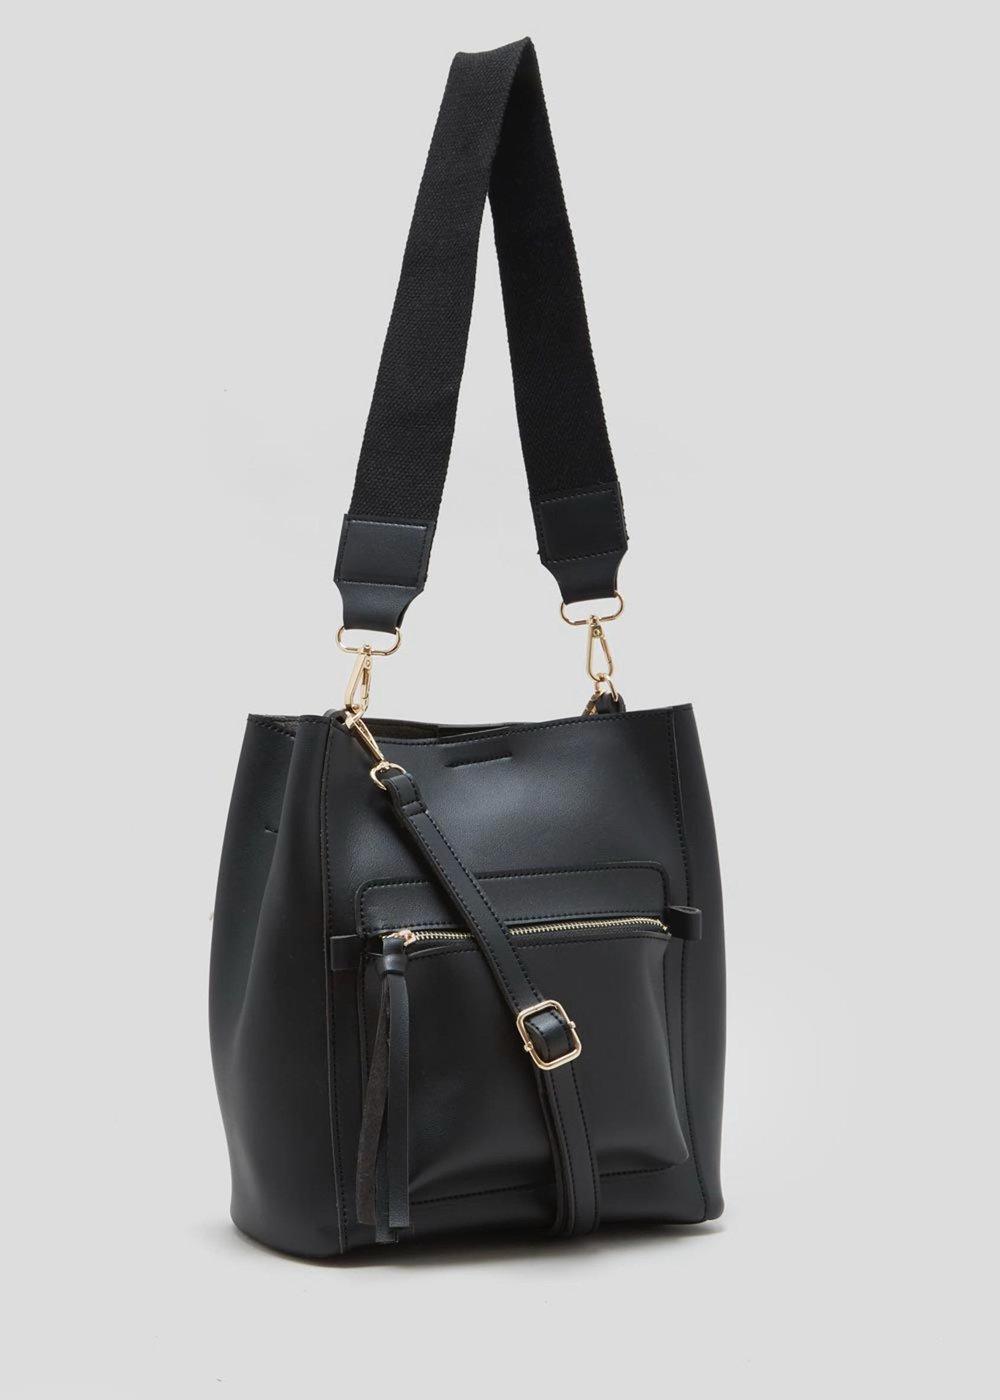 Bag, £18